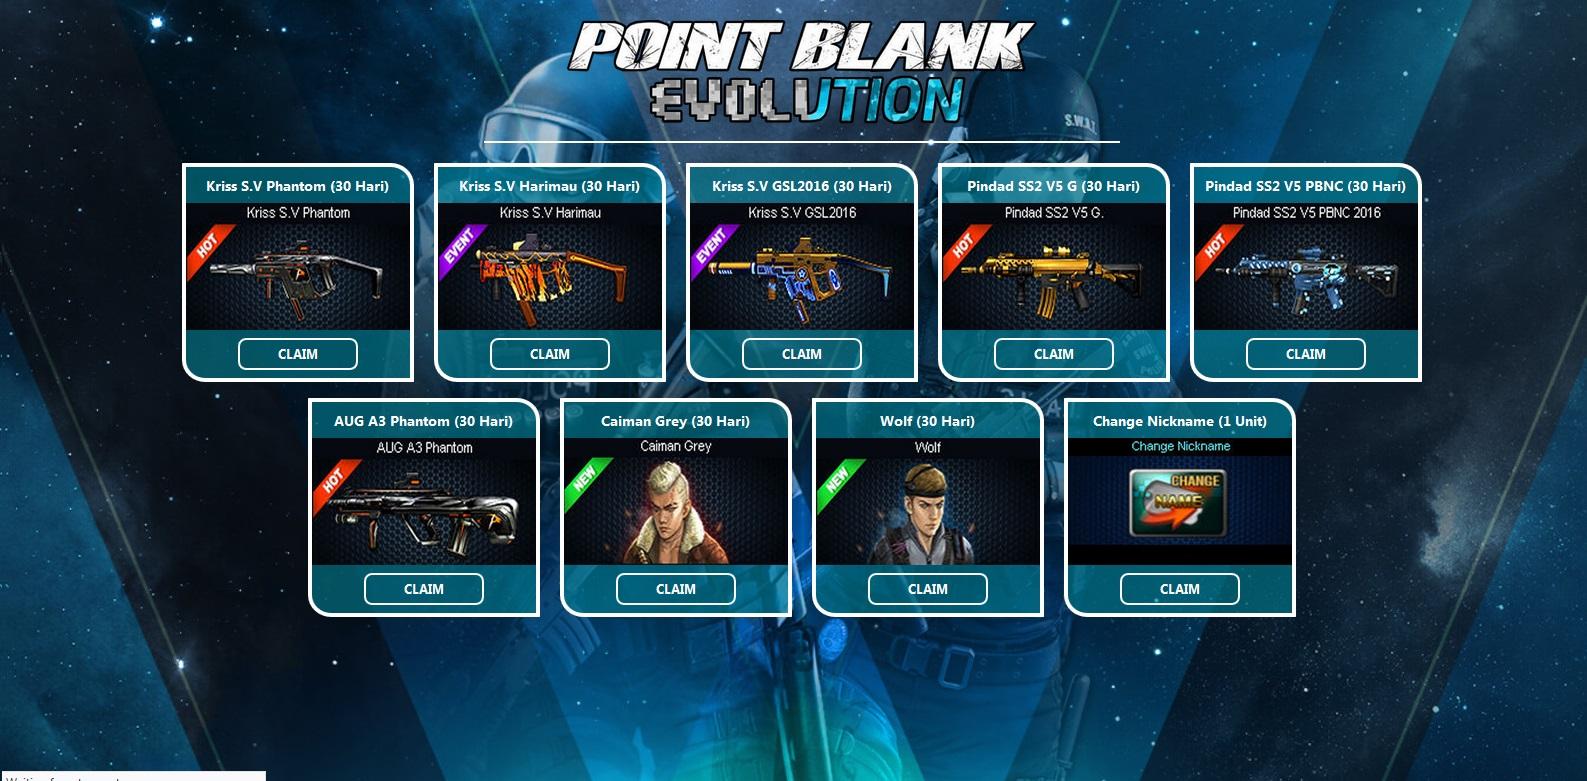 Script Phising Event Point Blank Evolution 2